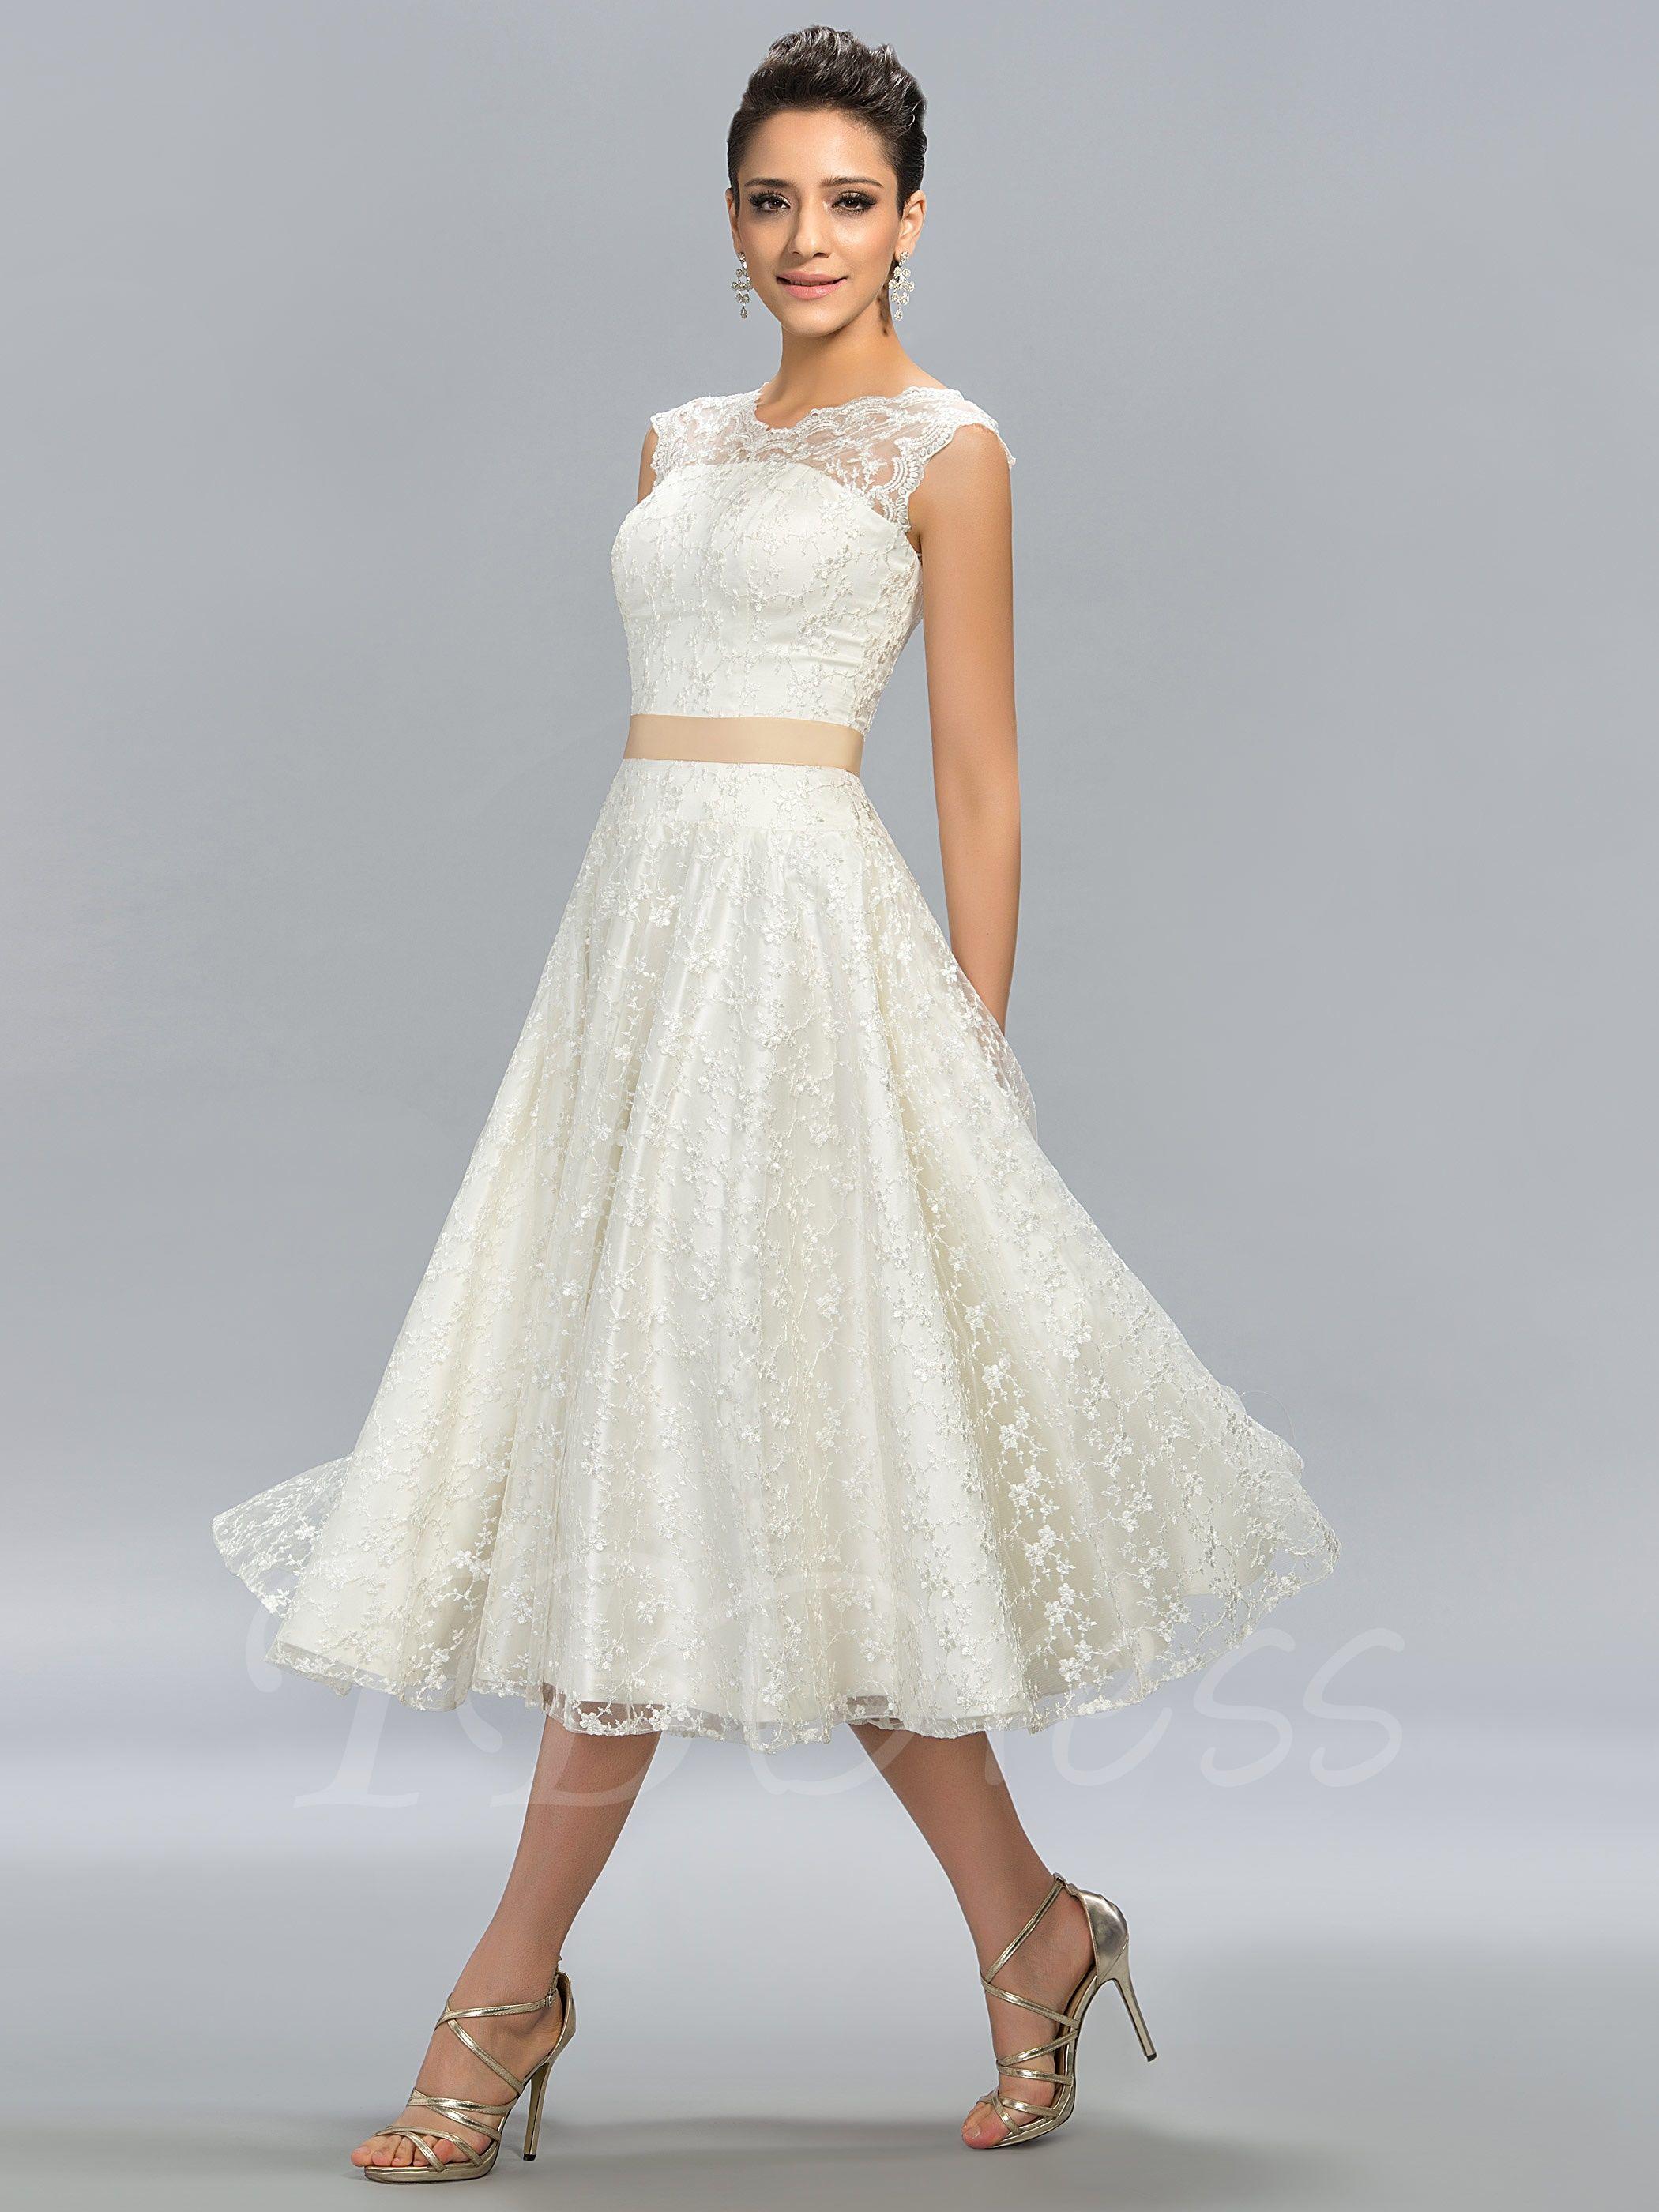 A Line Jewel Neck Lace Tea Length Junior Prom Dress Vintage White Lace Wedding Dress Short Lace Wedding Dress Tea Length Dresses [ 2800 x 2100 Pixel ]